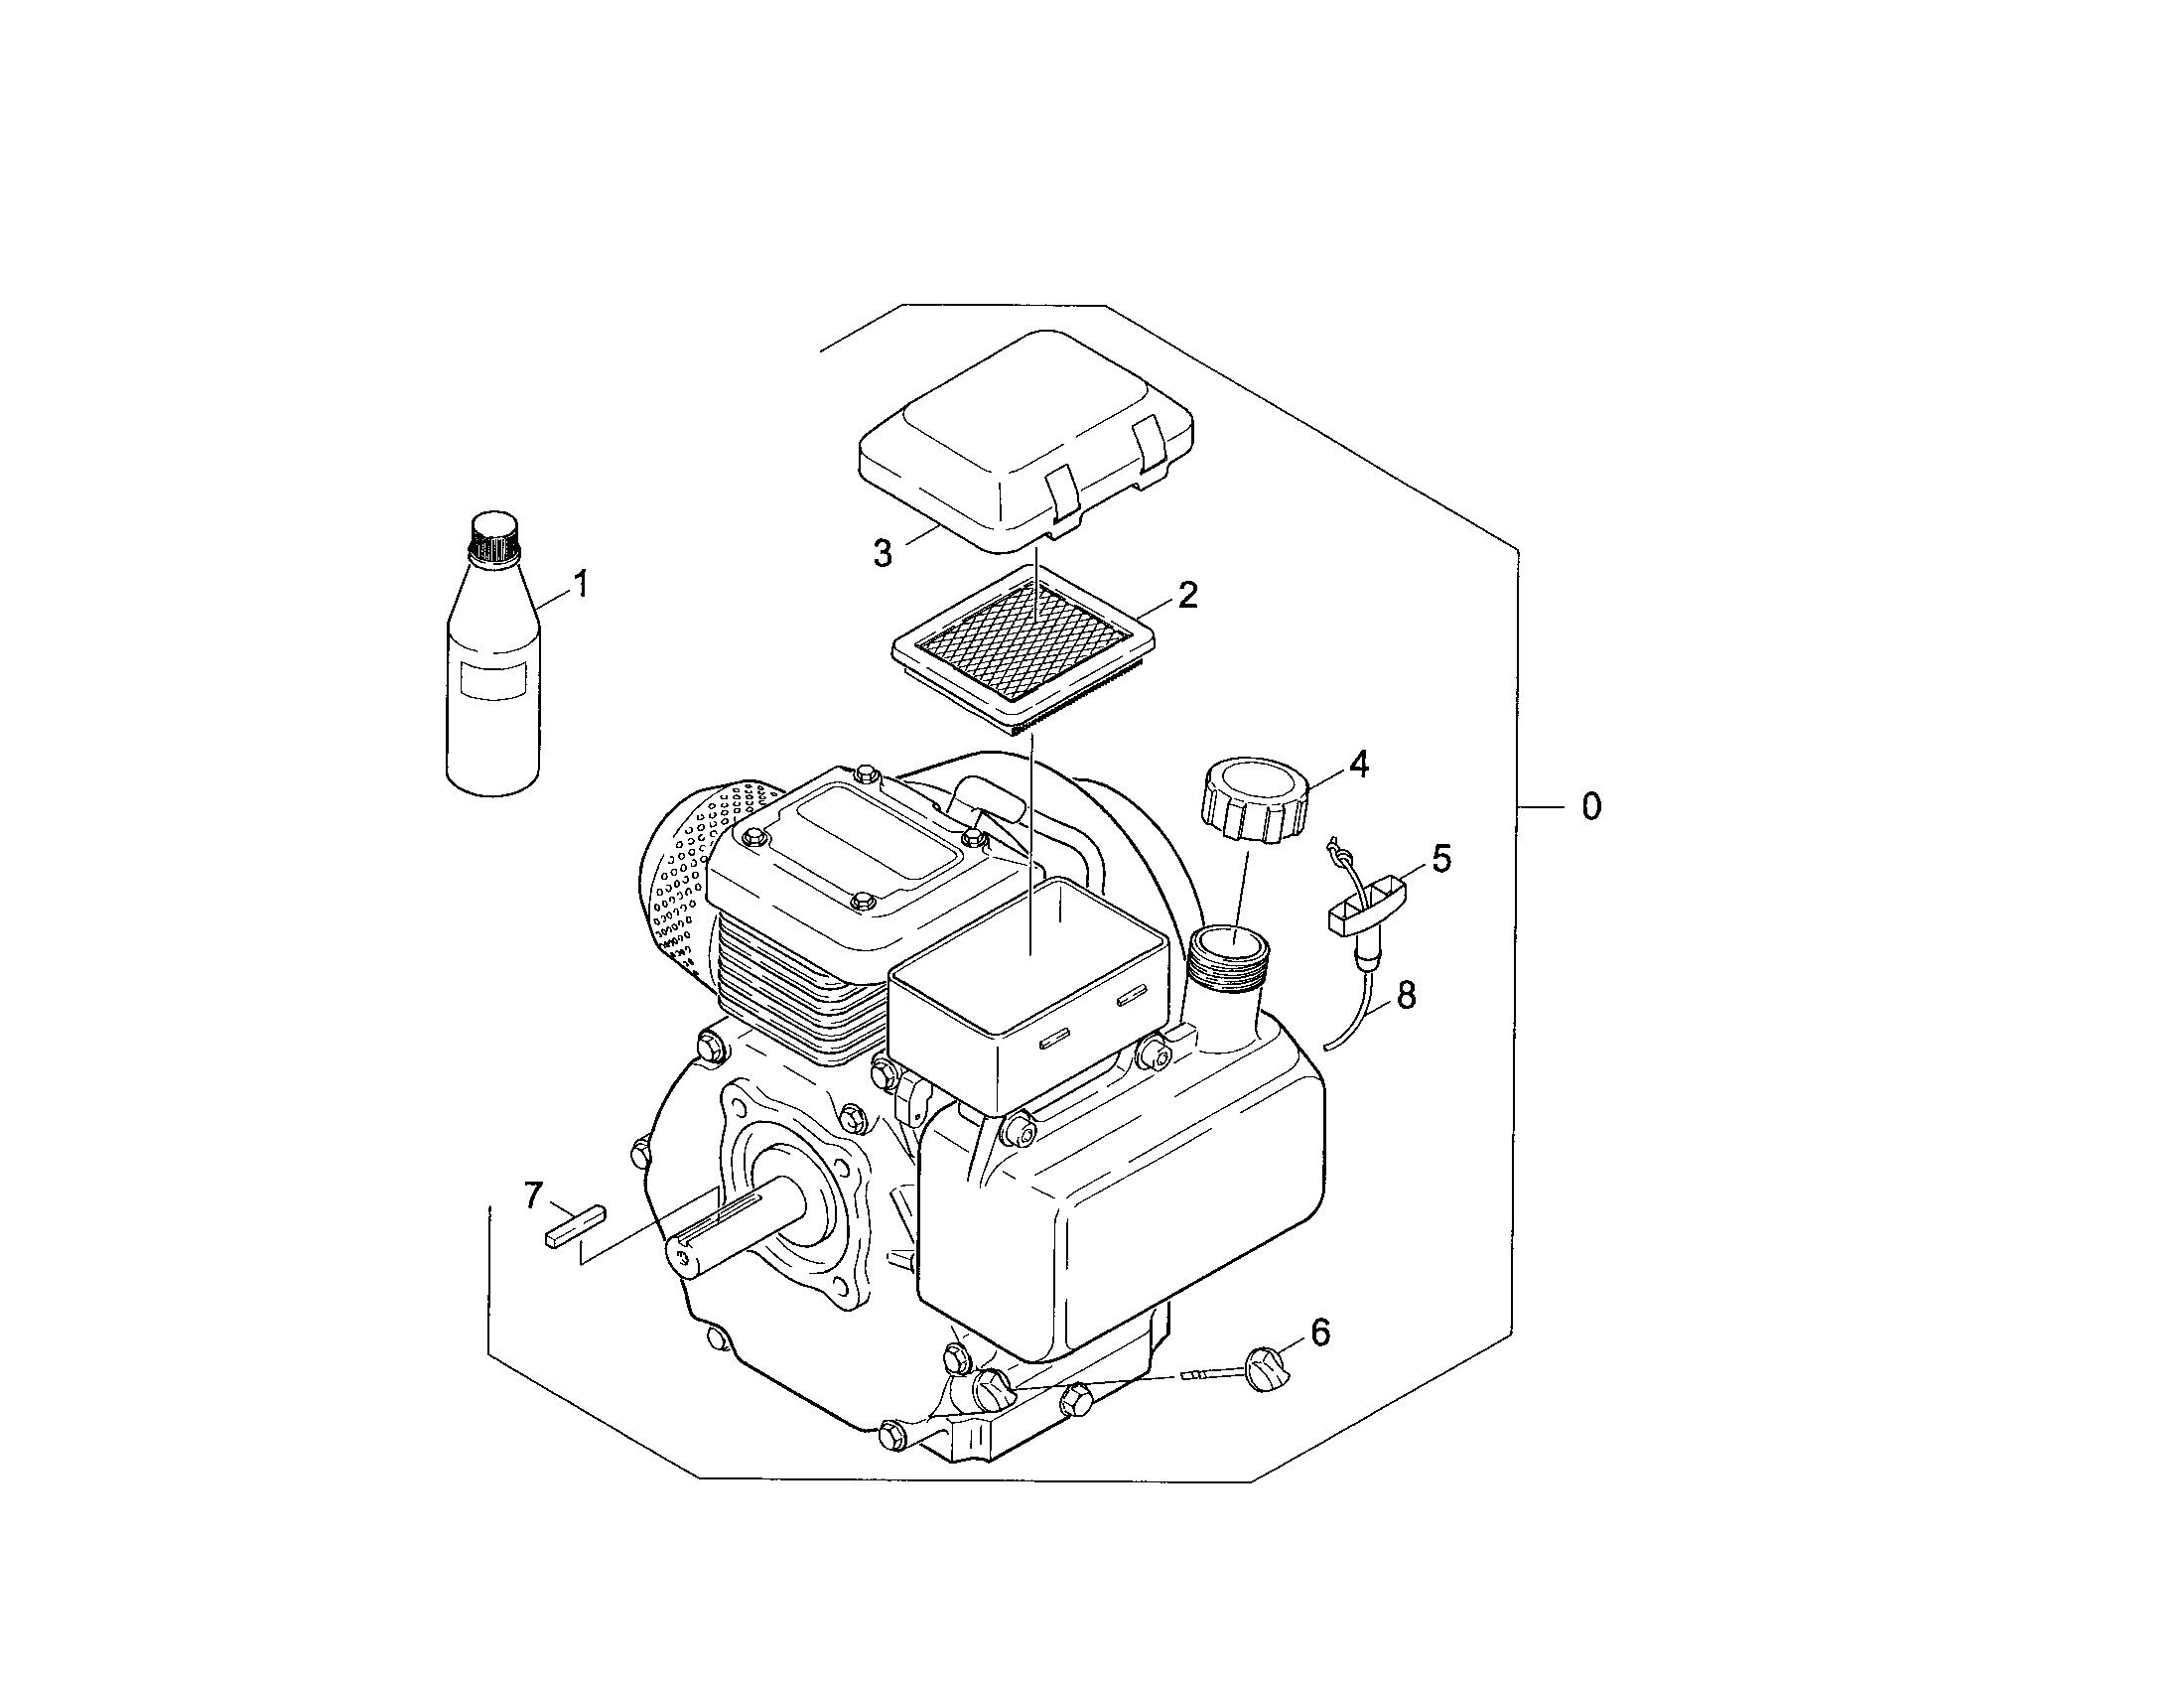 32 Karcher Pressure Washer Parts Diagram